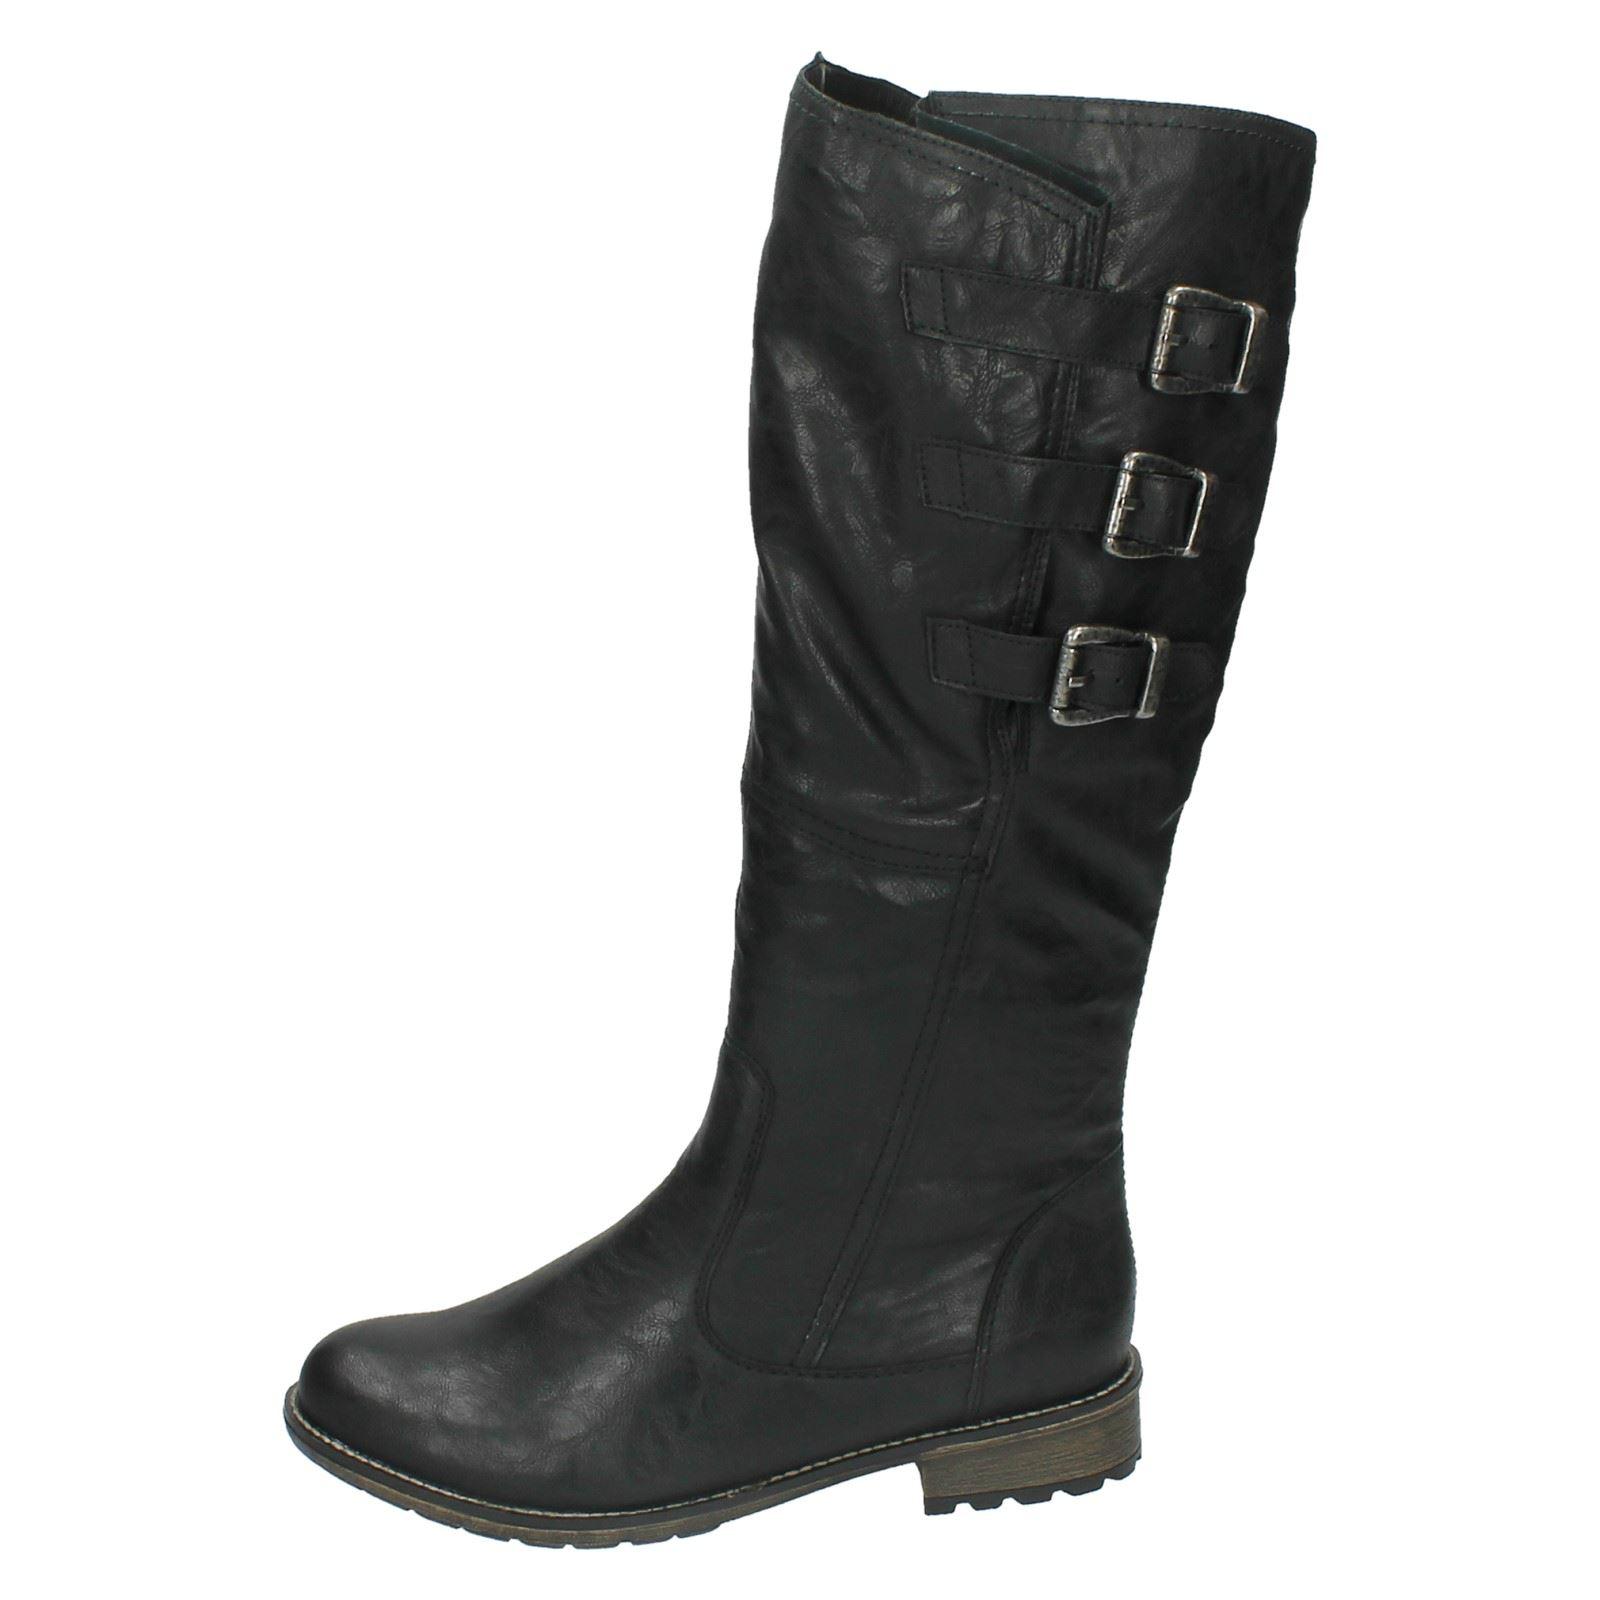 Biker Zip R3370 Ladies Style Leg Black High Casual Boots Synthetic Remonte pCxaC6qR